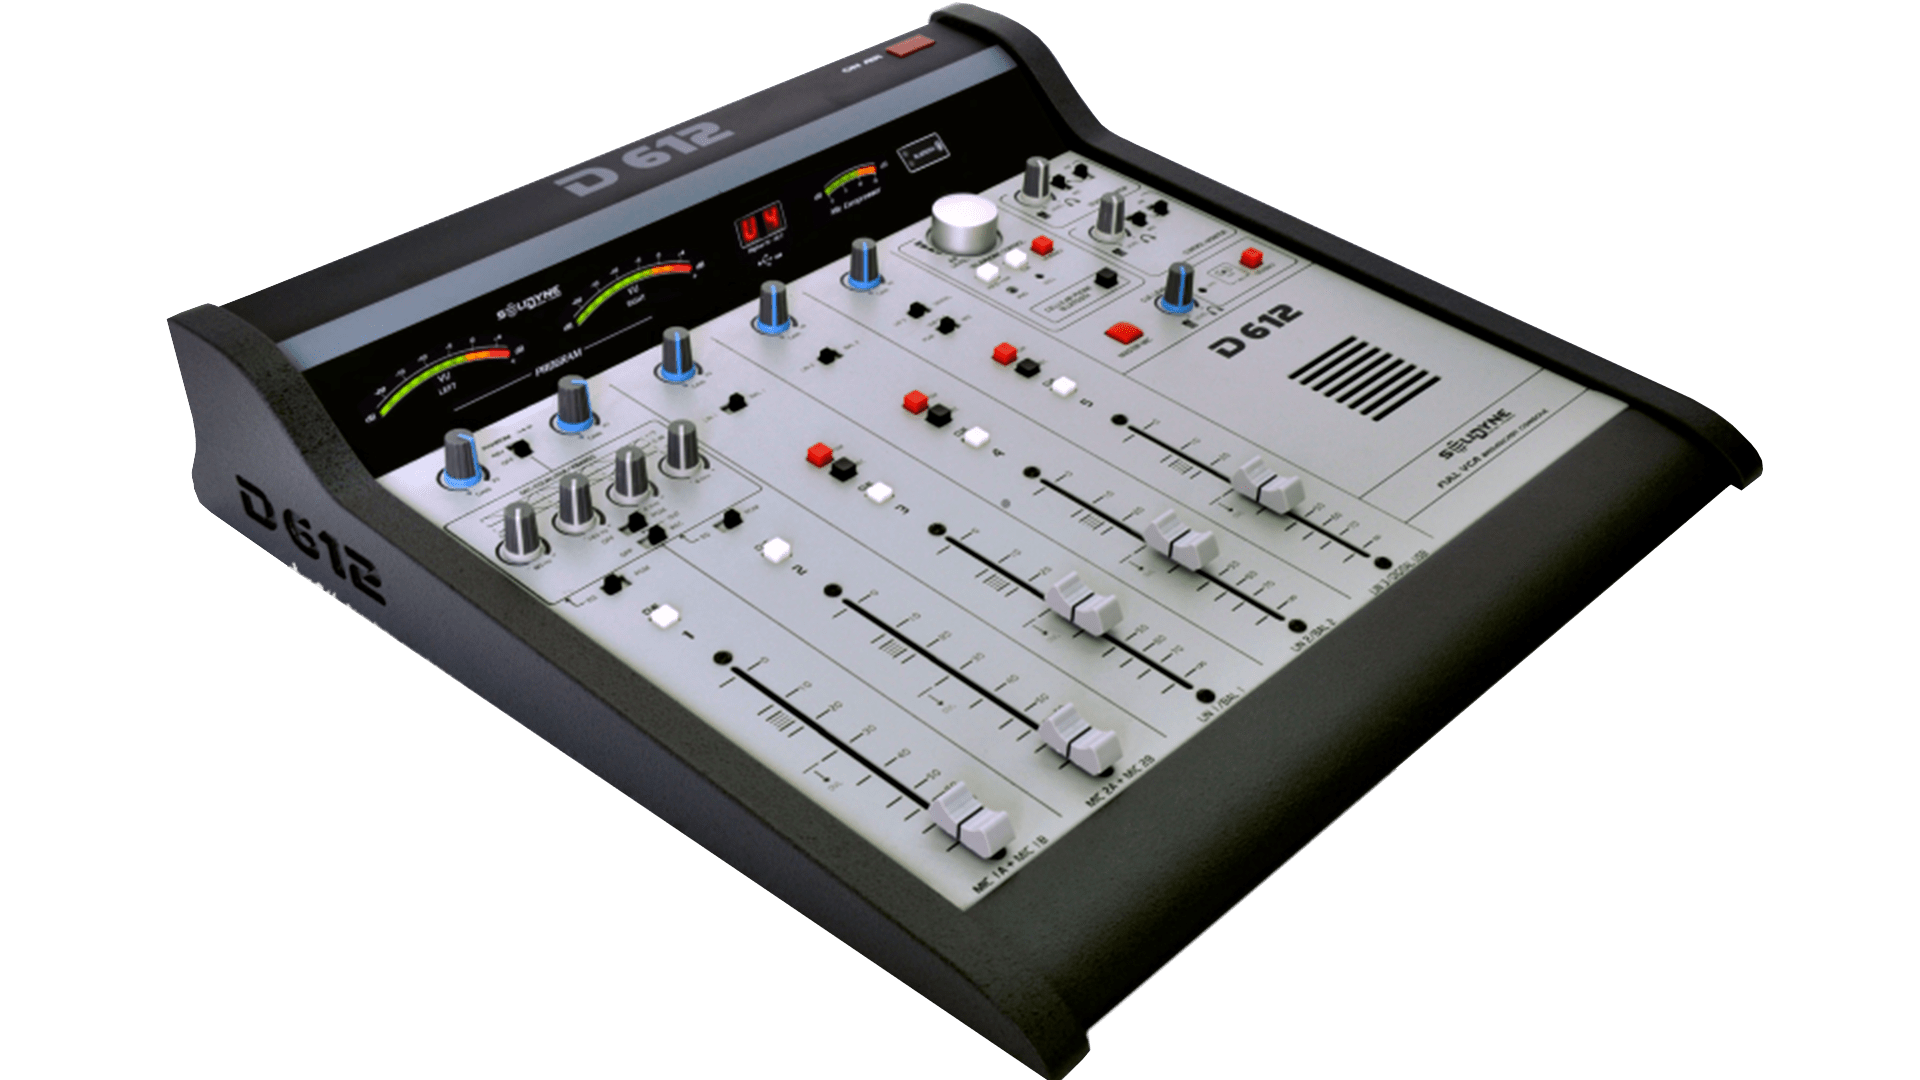 Consola-D612-Alpha-Solidyne-Streaming-Televisión-Radio-Emisoras-FM-AM-Internet-Virtual-Online-Buena-Imagen-Bogotá-Colombia